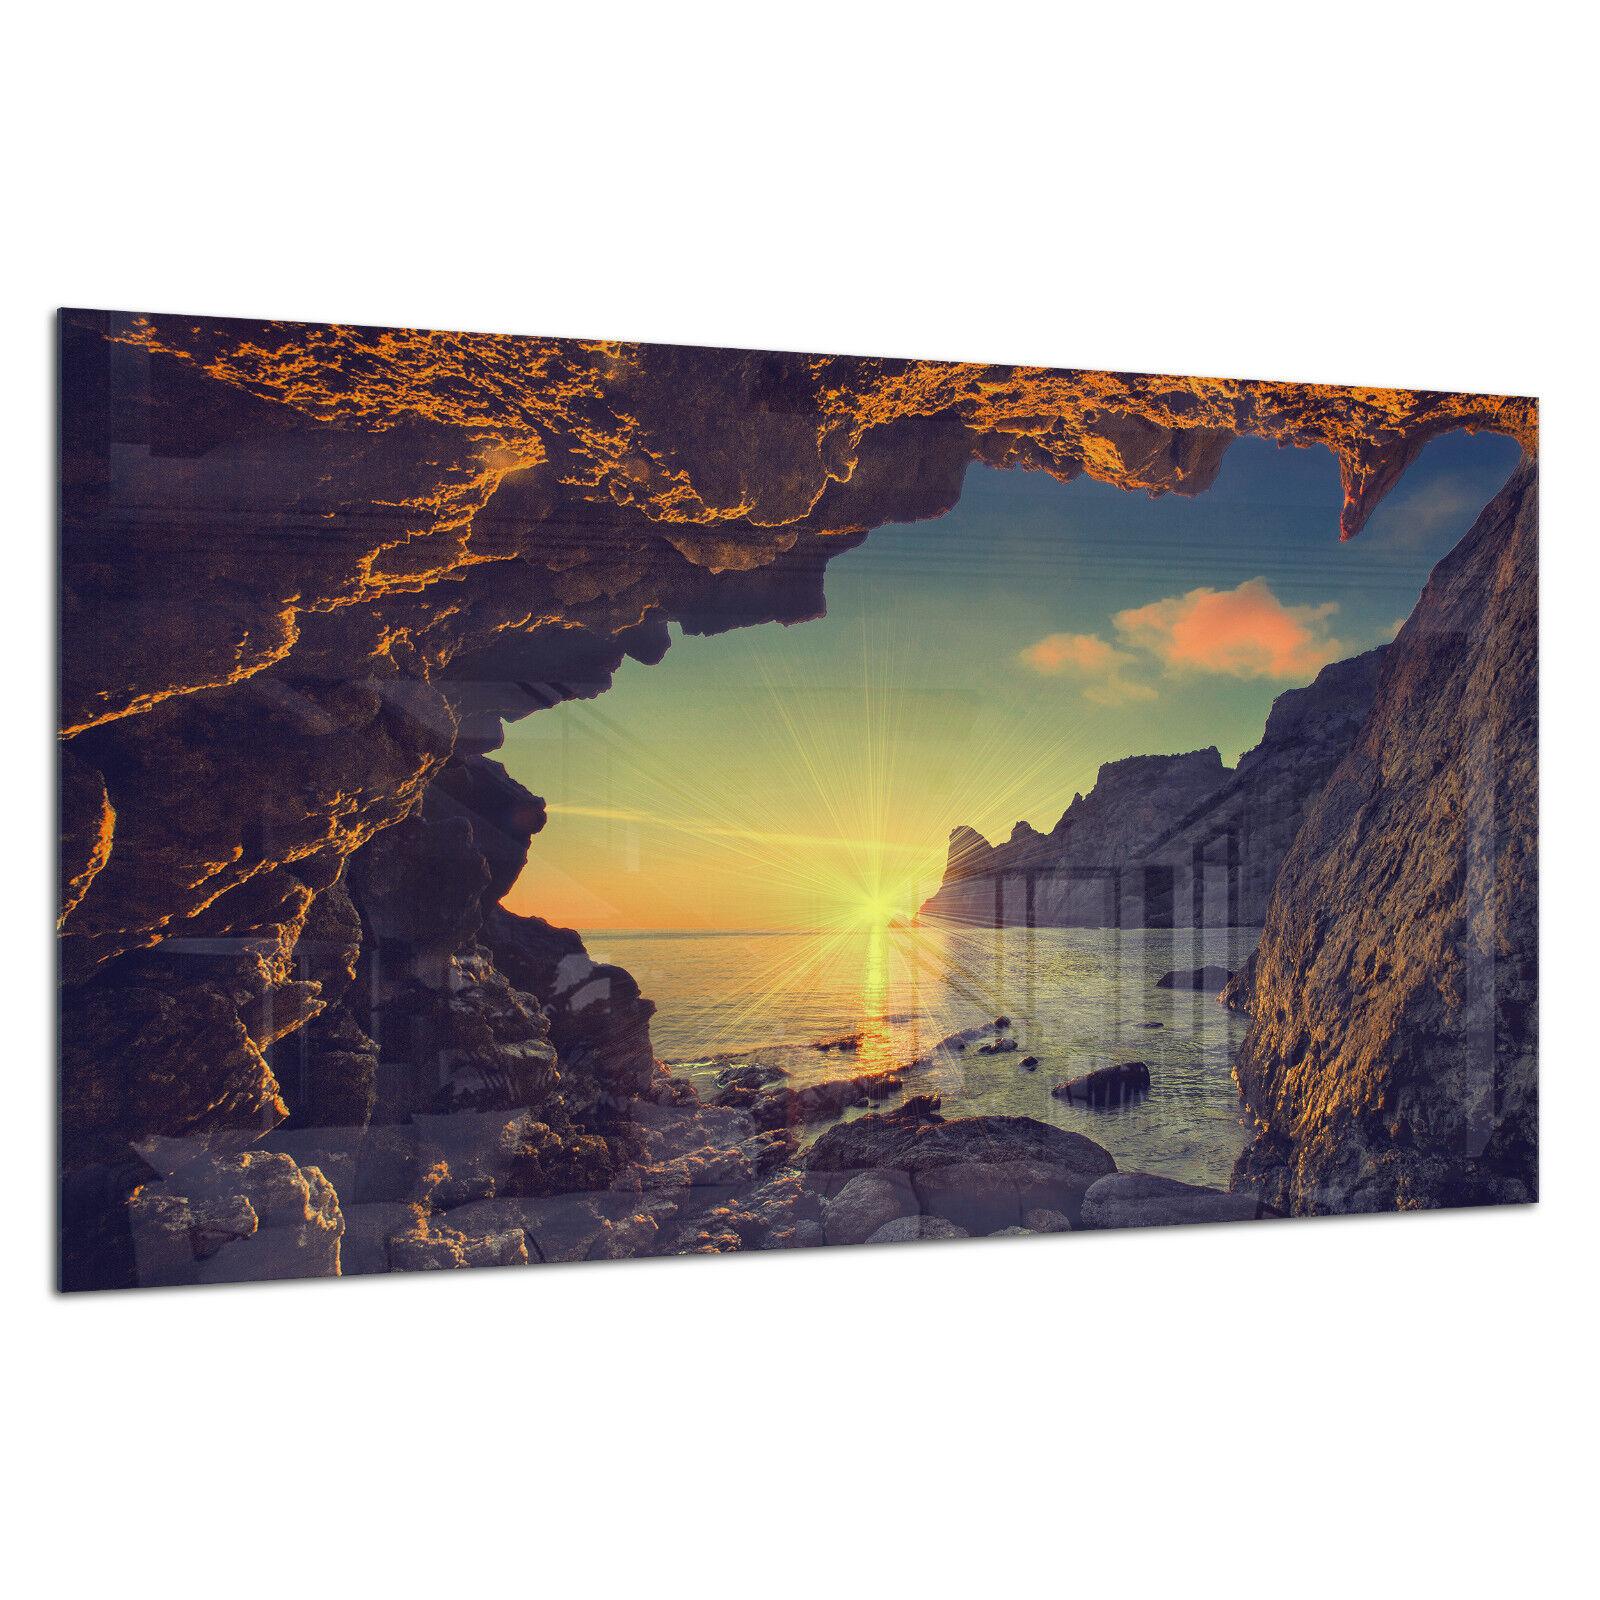 Vidrio templado Foto Impresión Parojo Arte Imagen Crimea Cliff amanecer Prizma GWA0339